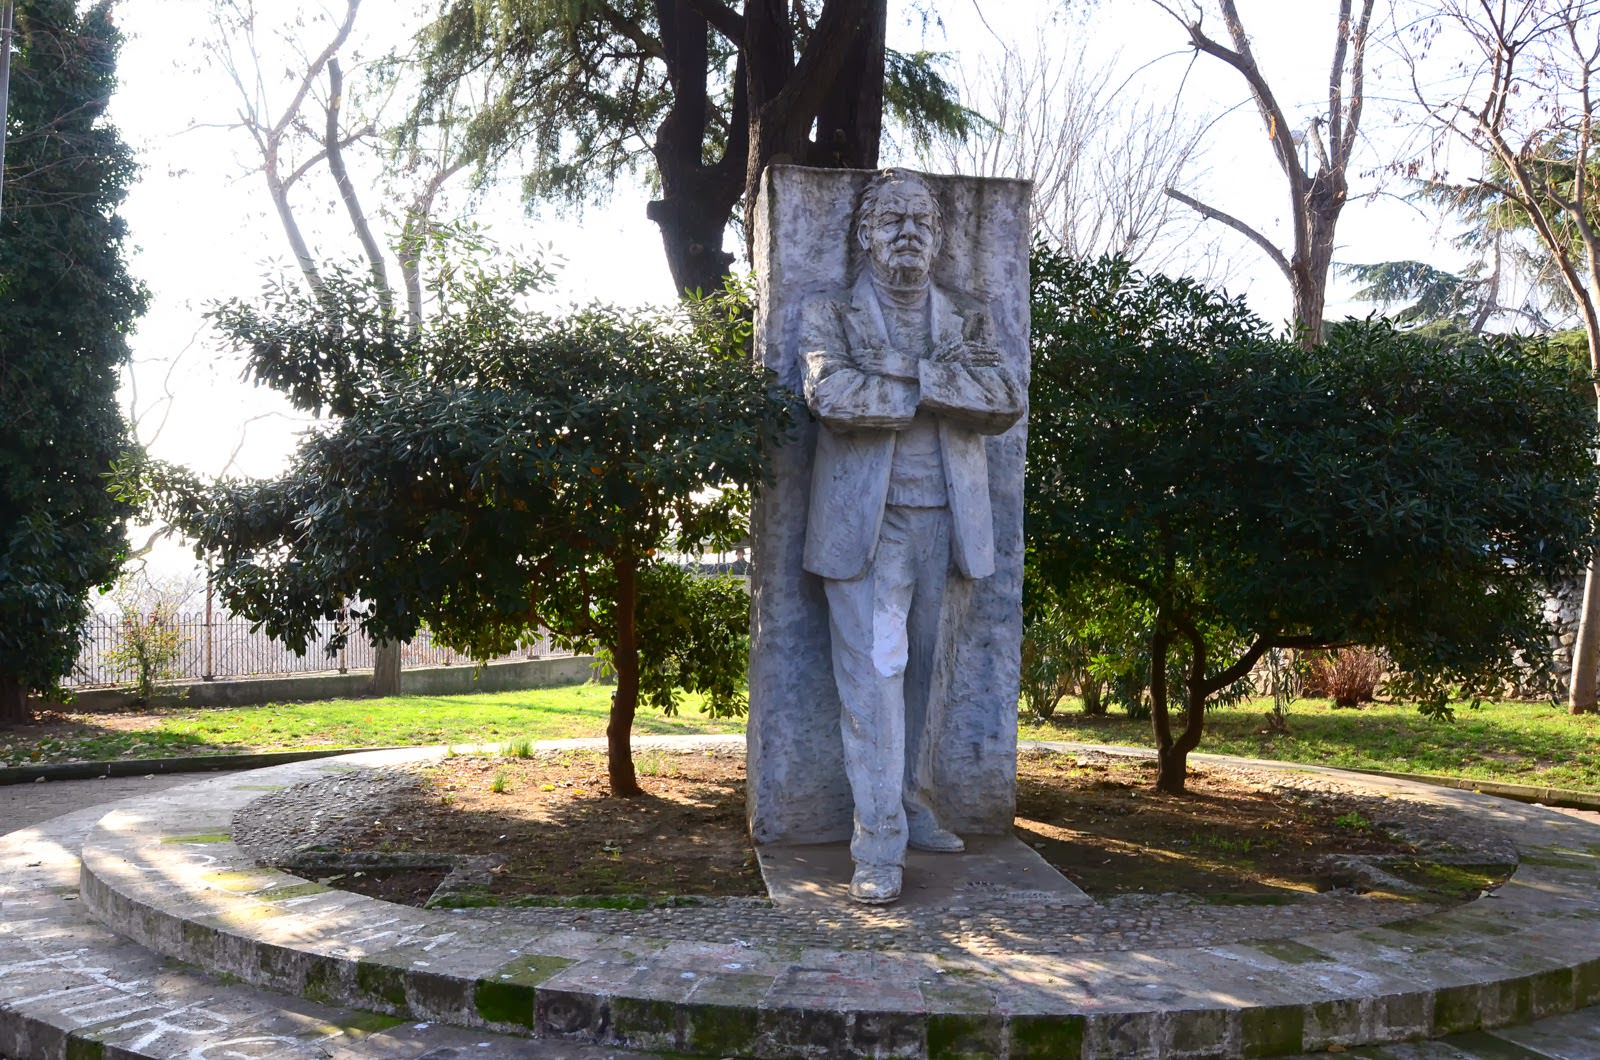 Melih Cevdet Anday, Metin Yurdanur Eseri, 1994